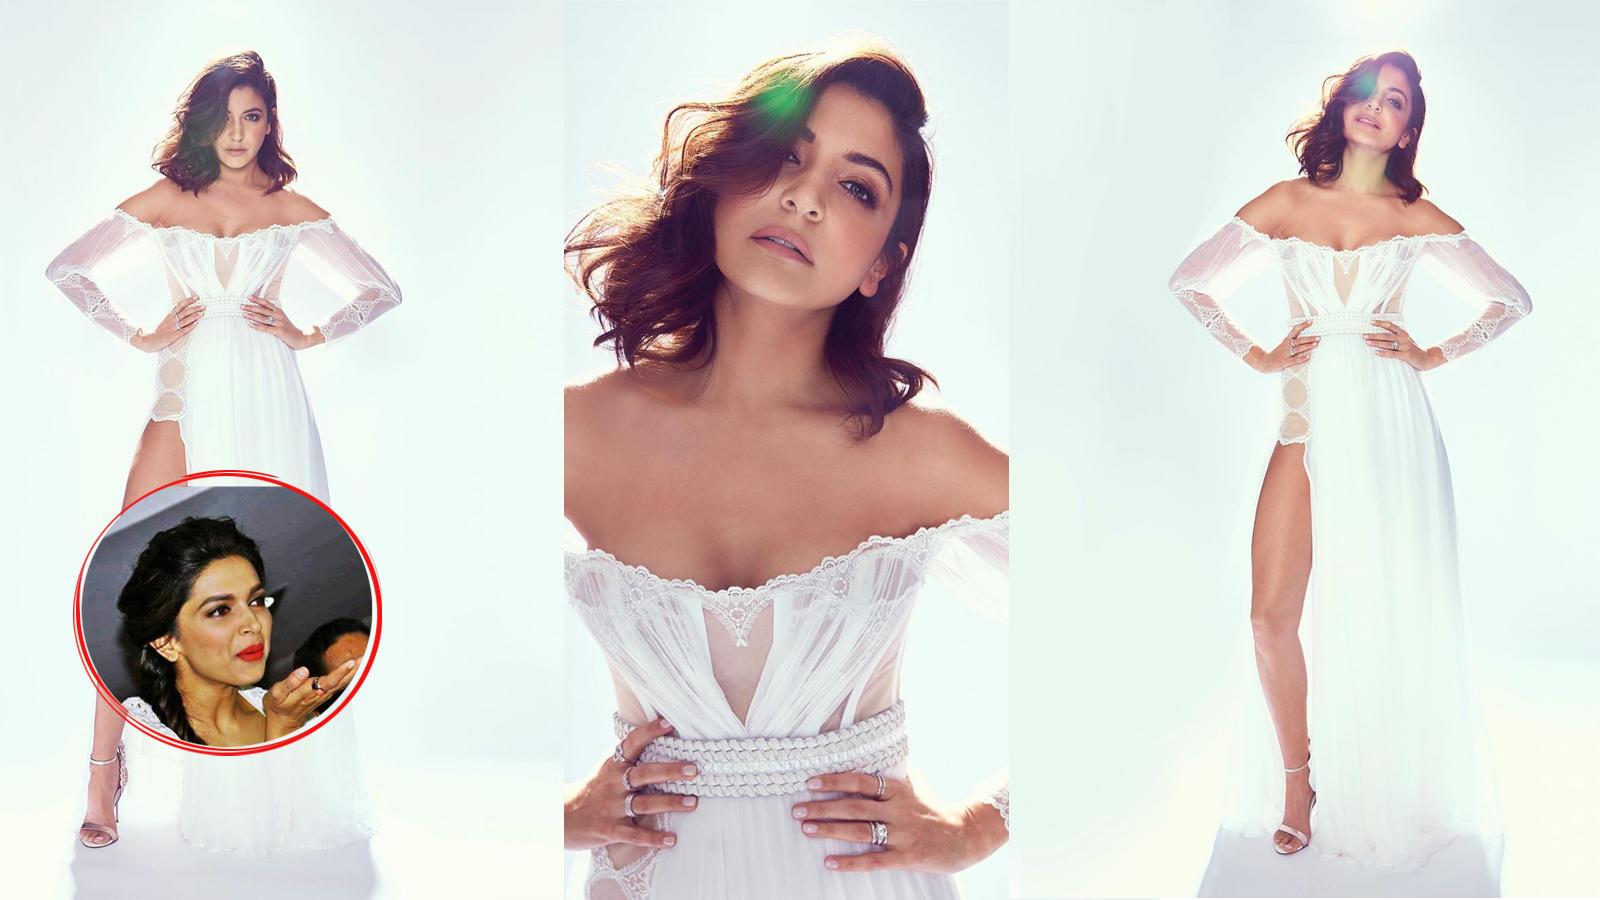 Deepika Padukone gushes over Anushka Sharma's all-white style statement